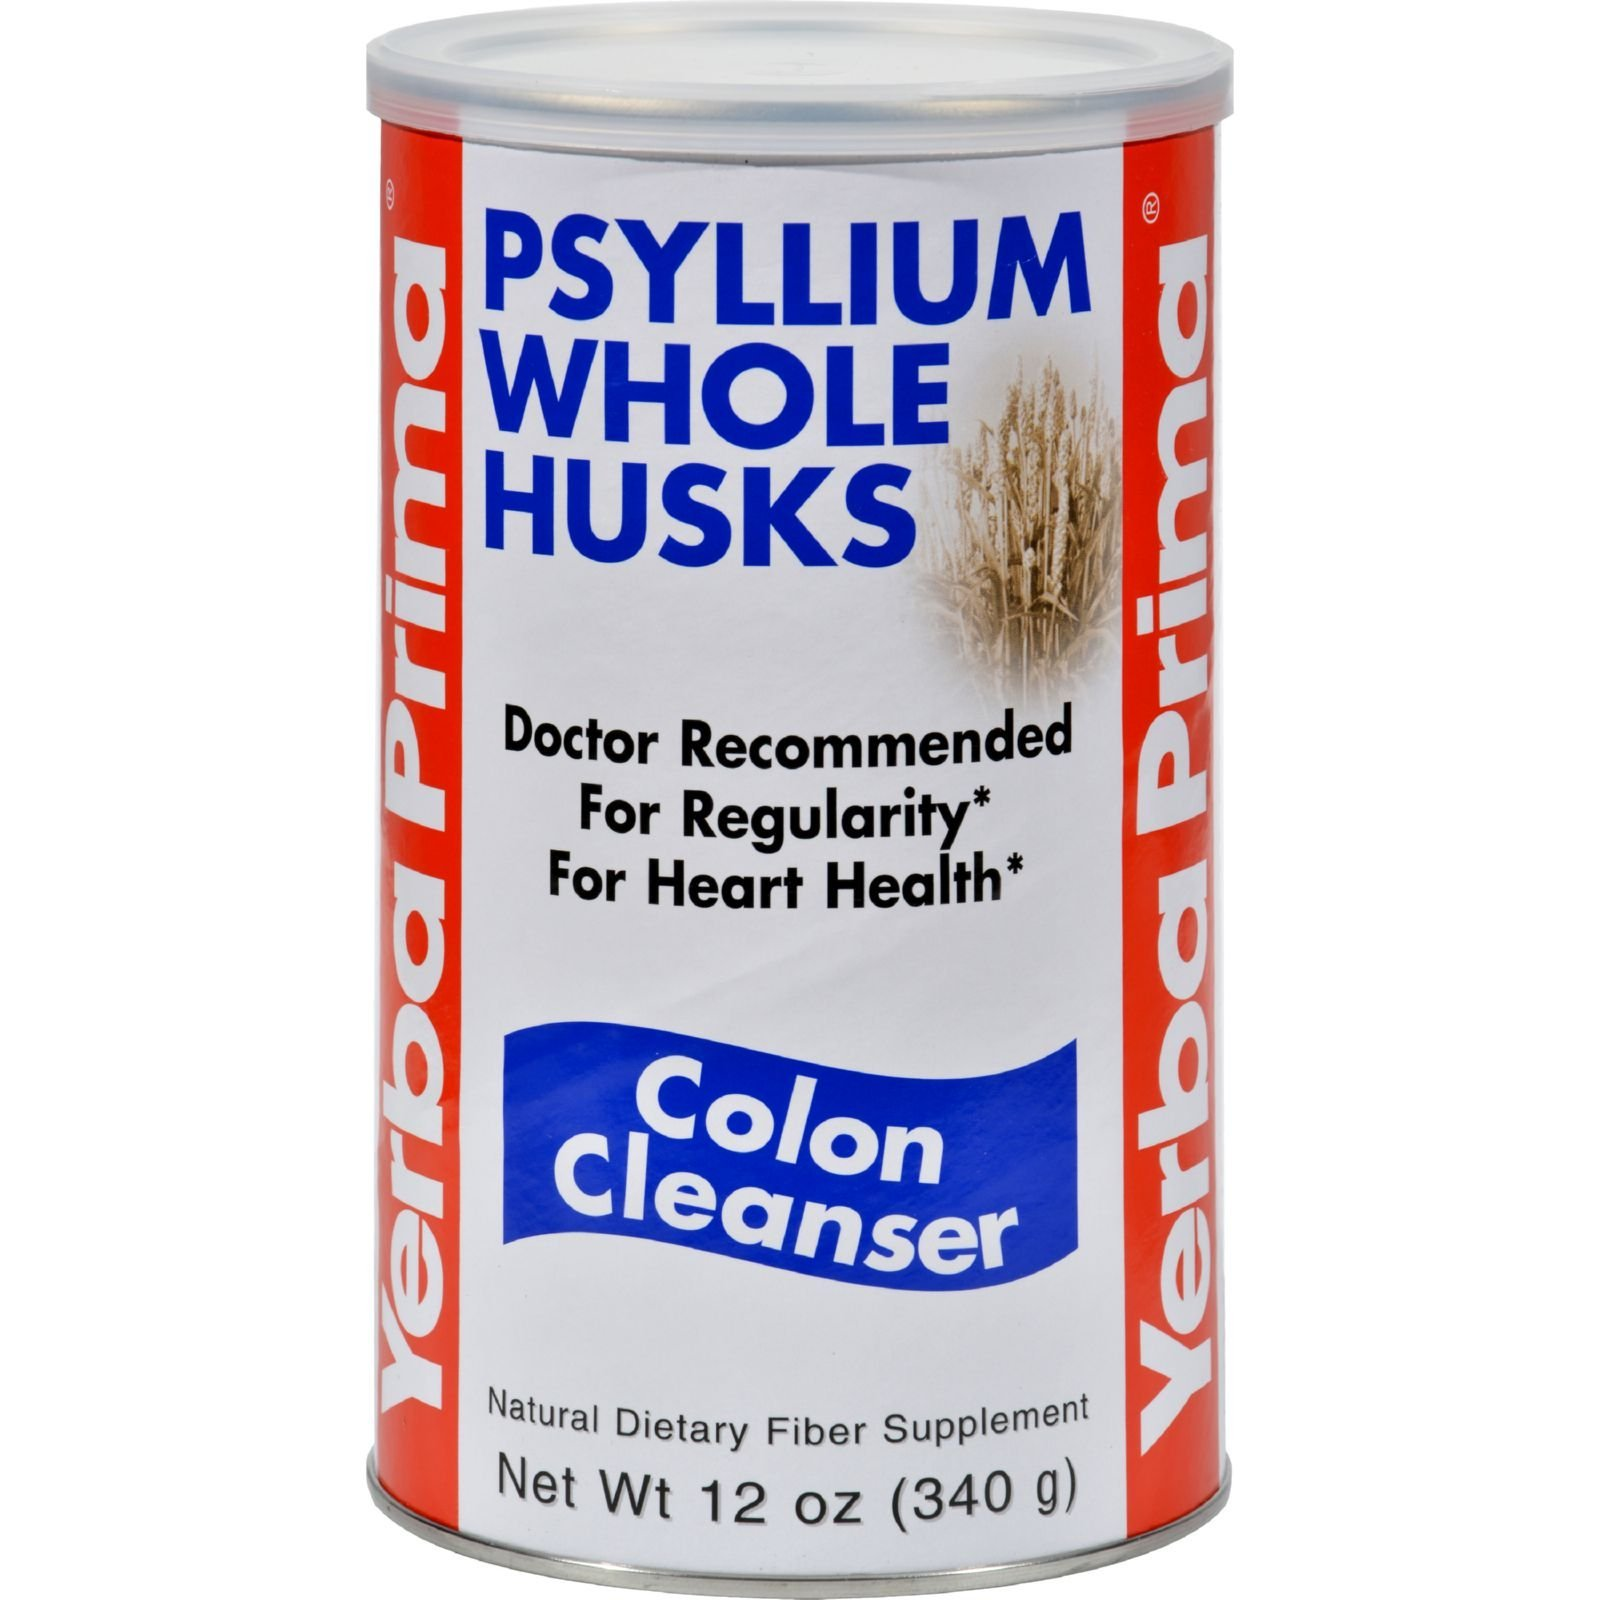 Yerba Prima Psyllium Whole Husks, Colon Cleanser 12 oz ( Pack of 2)